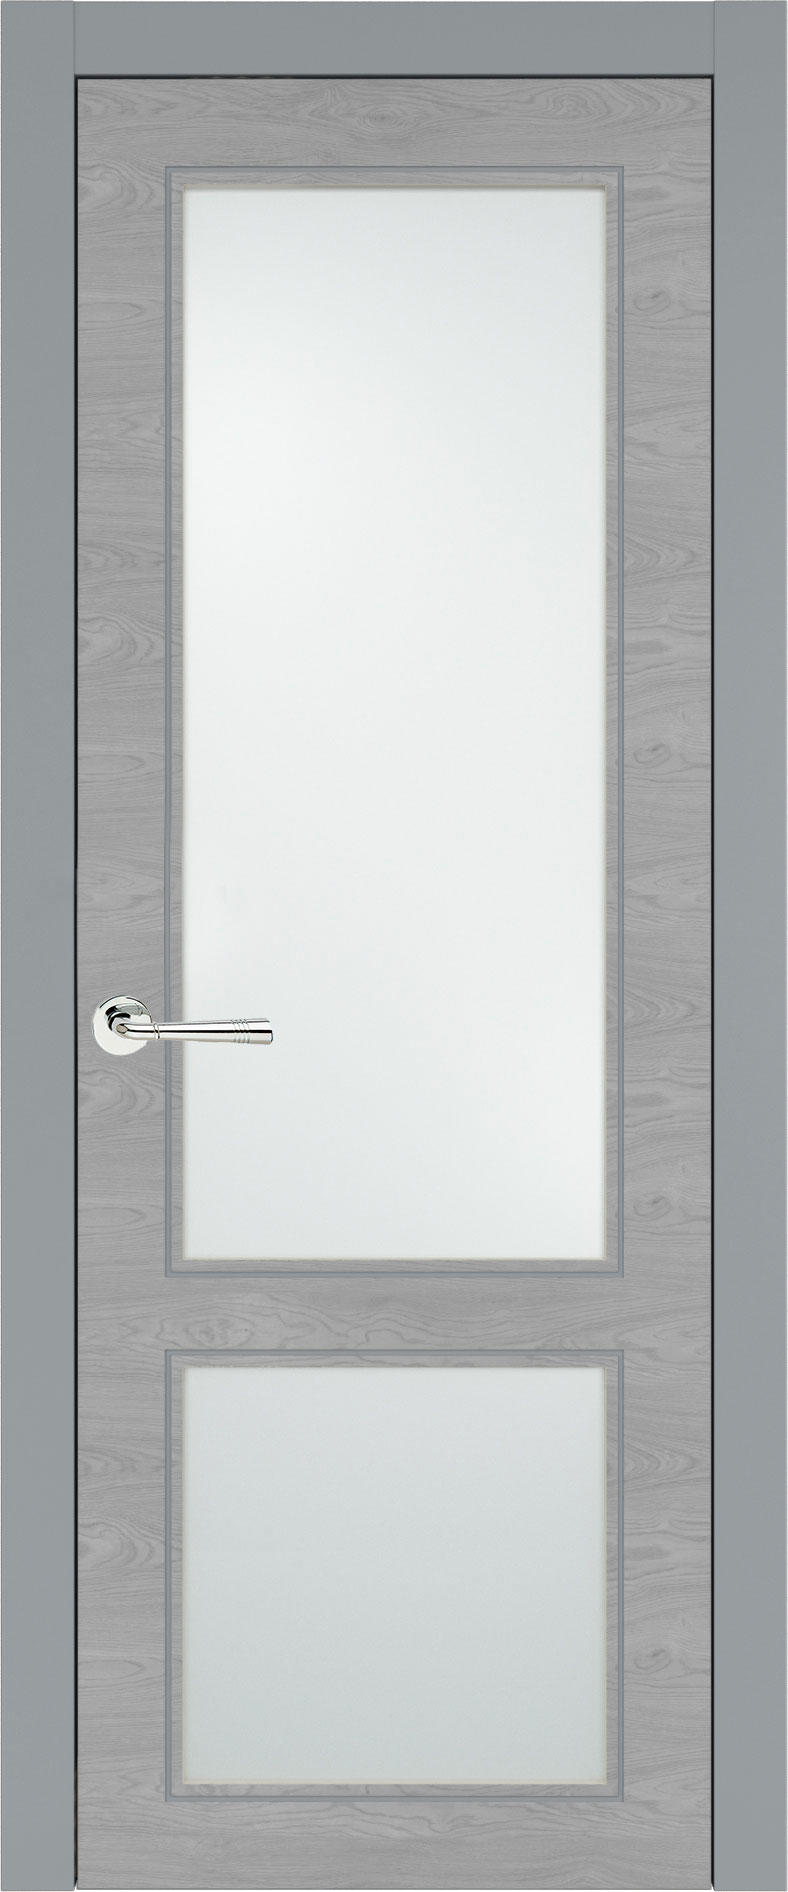 Dinastia Neo Classic цвет - Серебристо-серая эмаль по шпону (RAL 7045) Со стеклом (ДО)